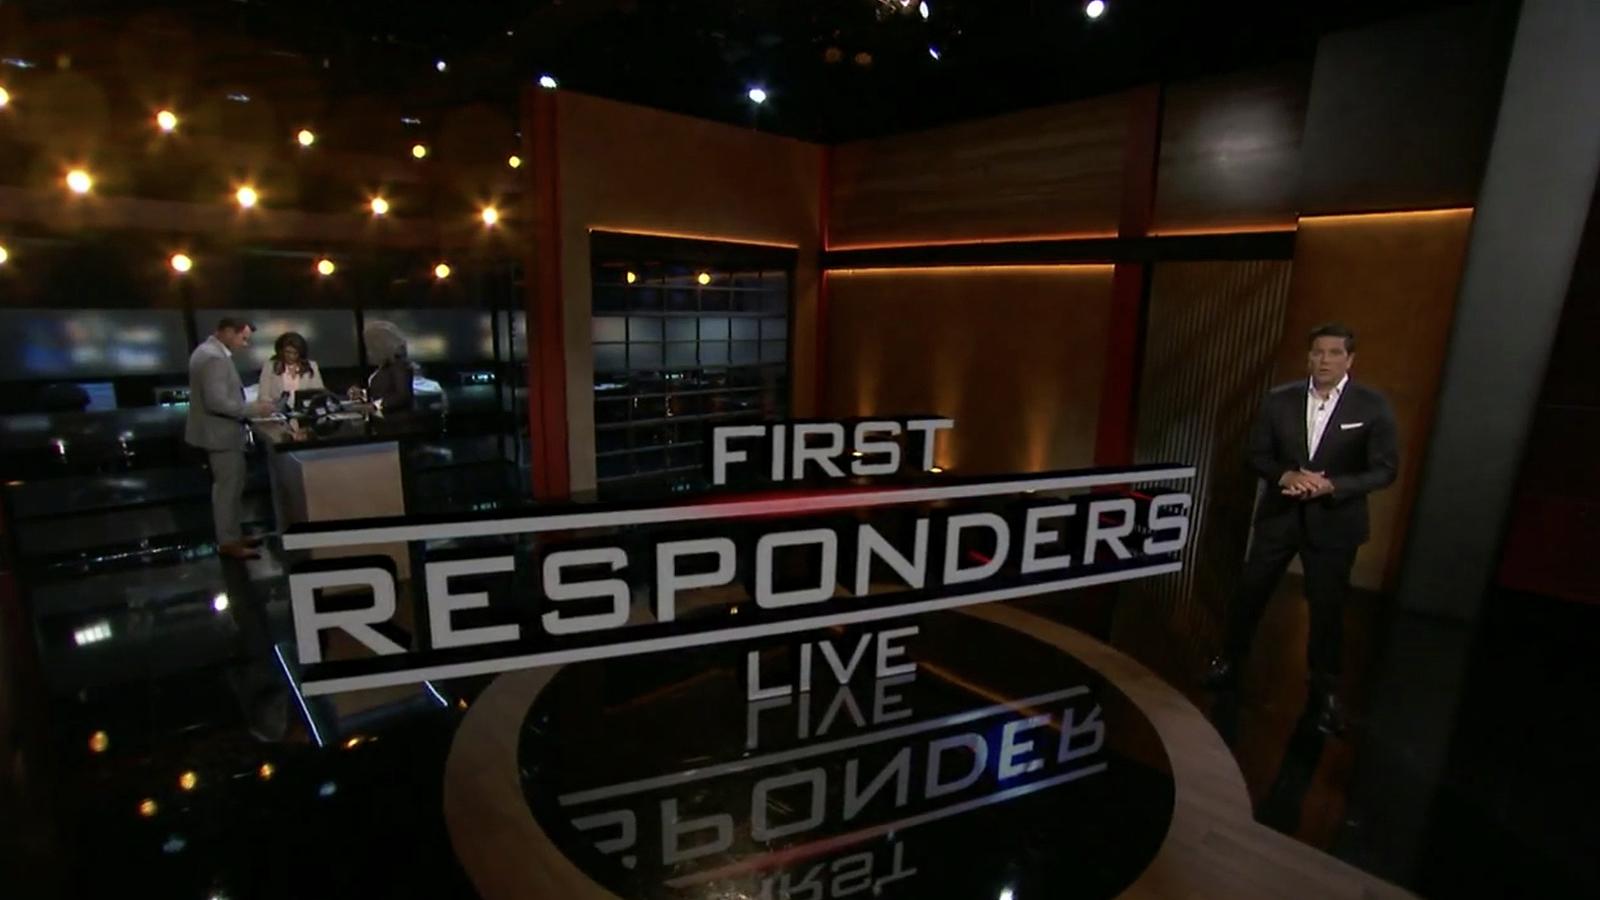 NCS_First-Responders-Live_Fox-AR-Set_0001